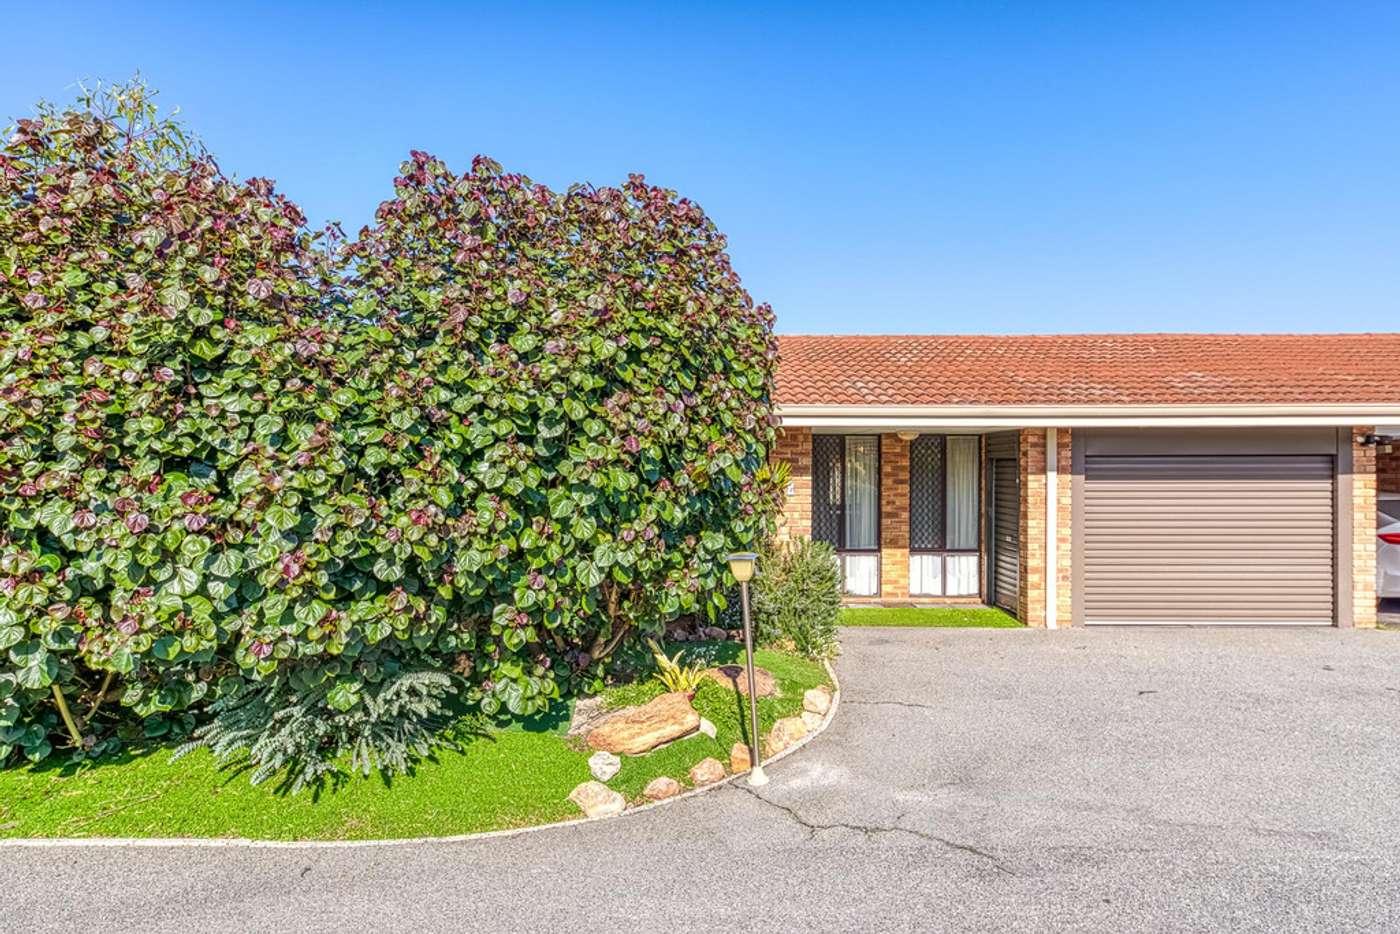 Main view of Homely villa listing, 5/13 Eudanda Place, Cannington WA 6107